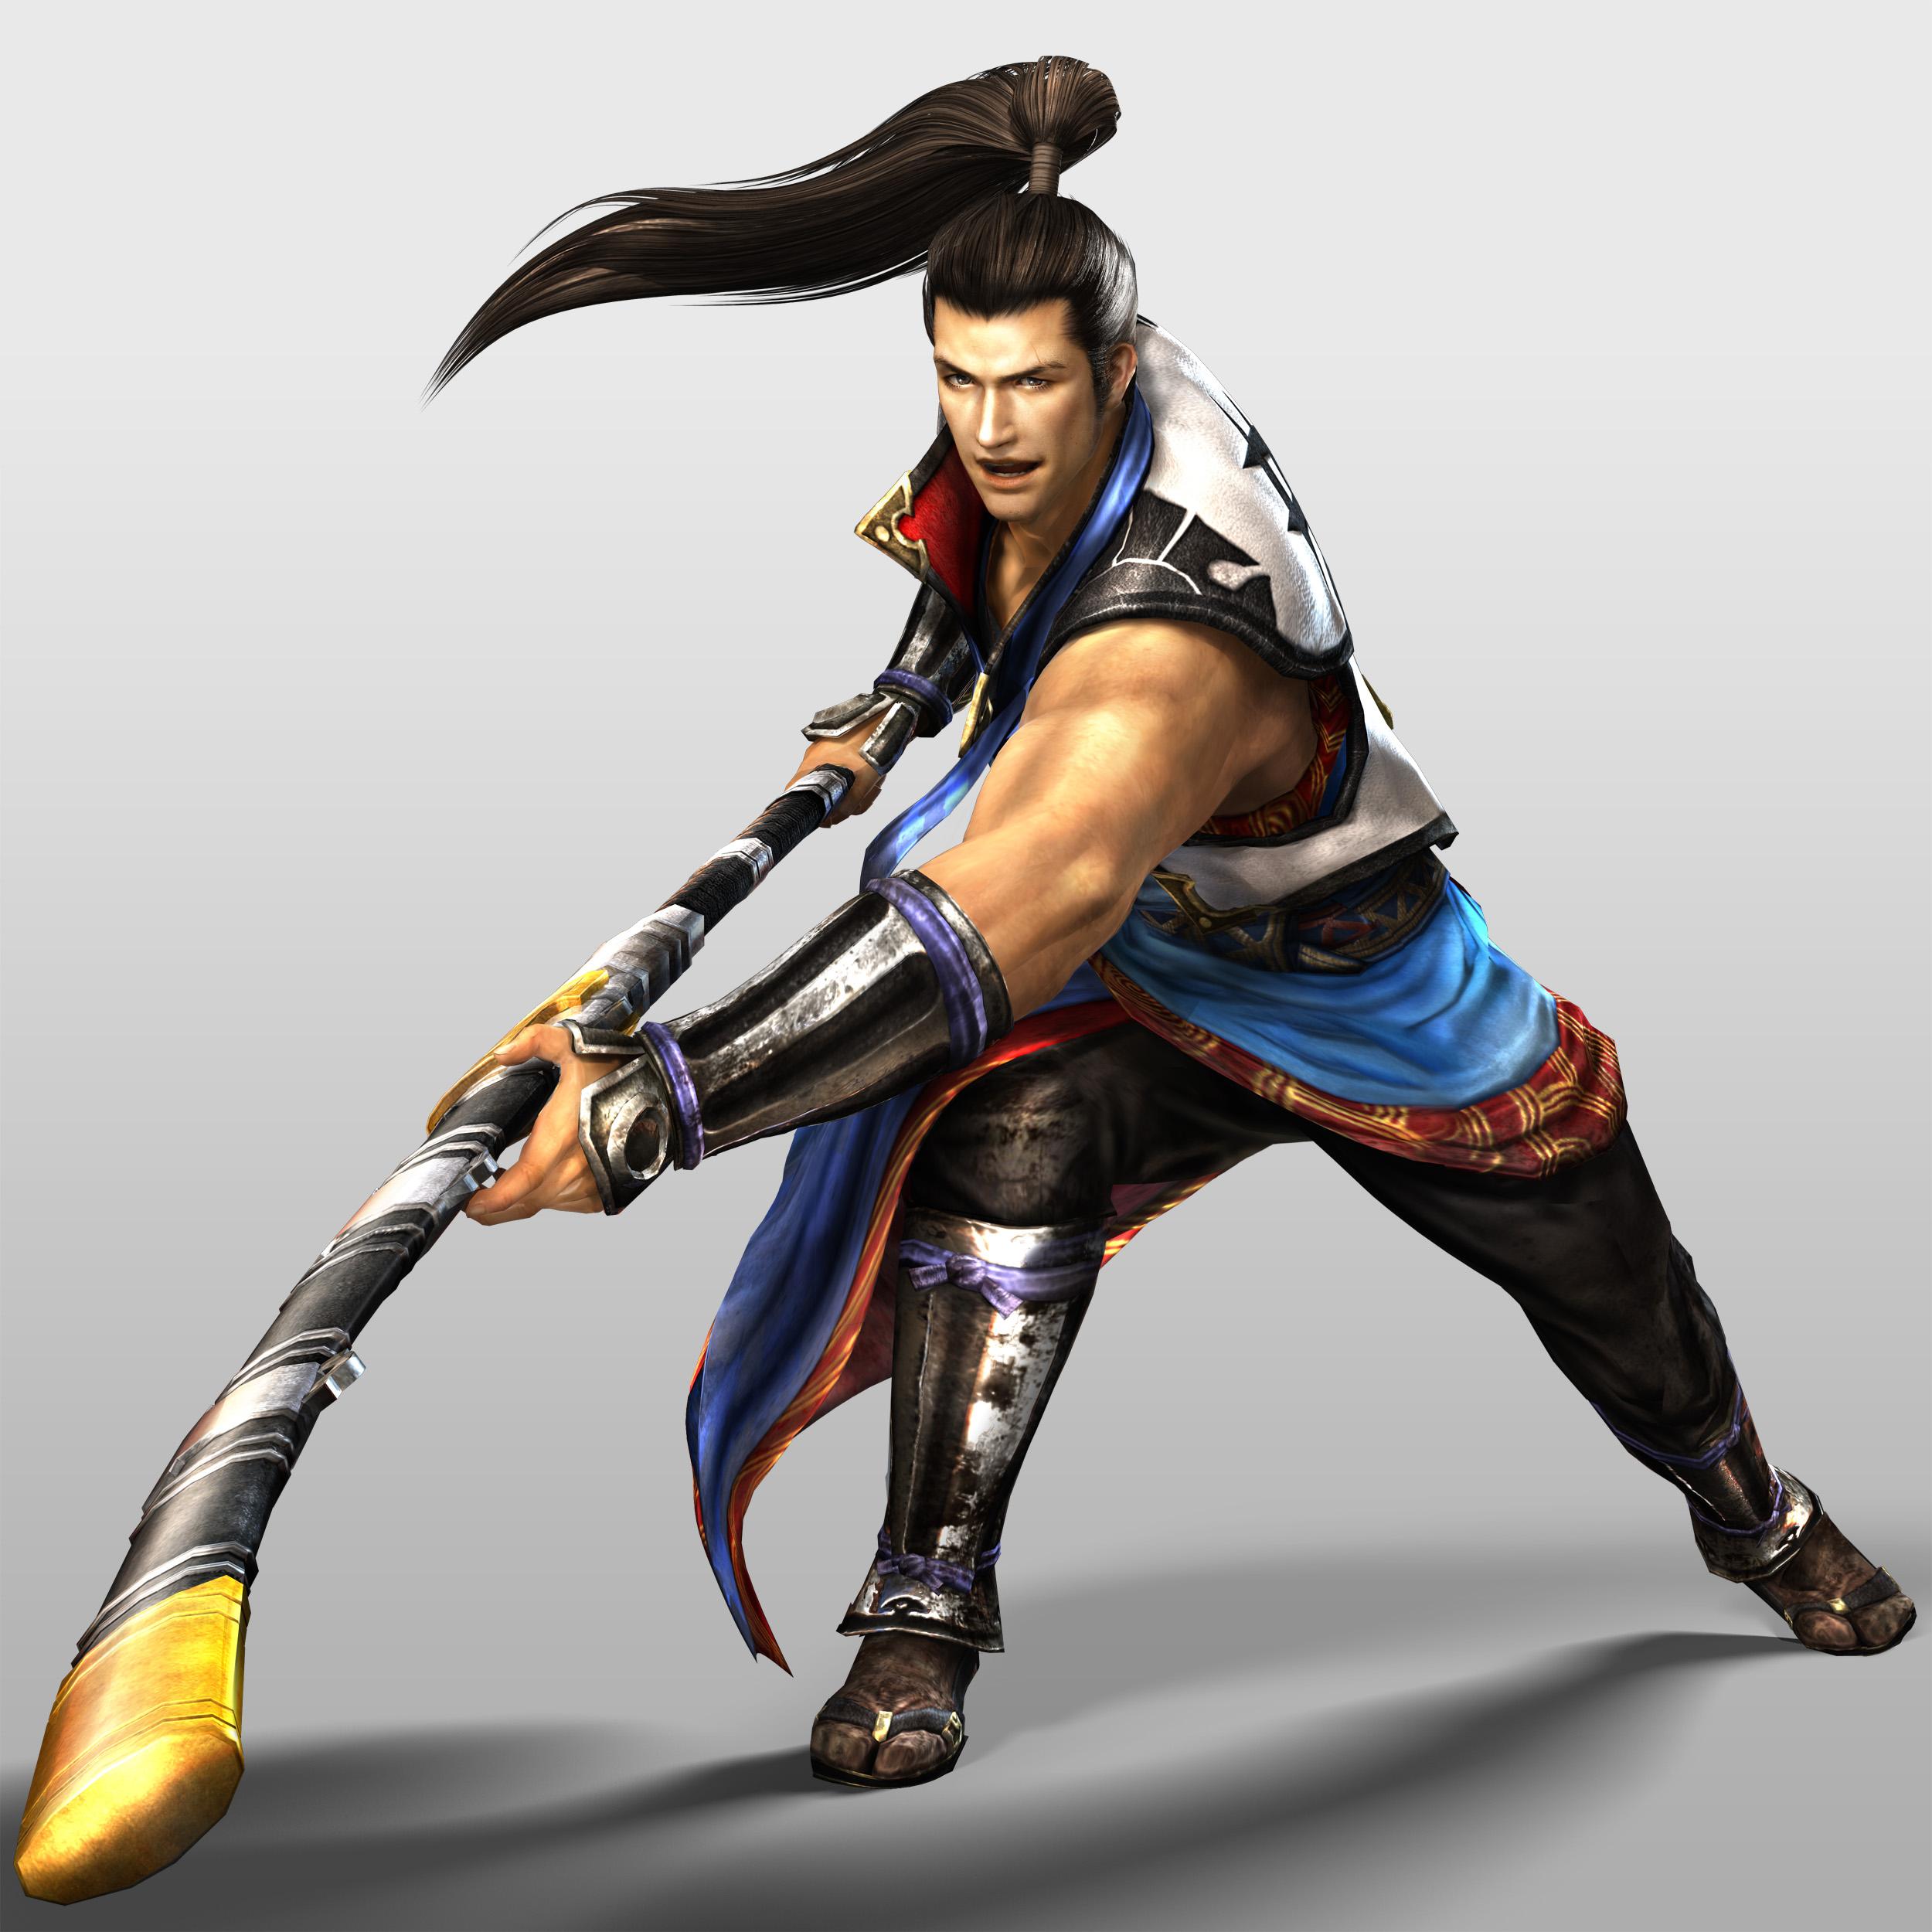 Warriors Orochi 4 Characters List: Image - Munenori-sw4.jpg